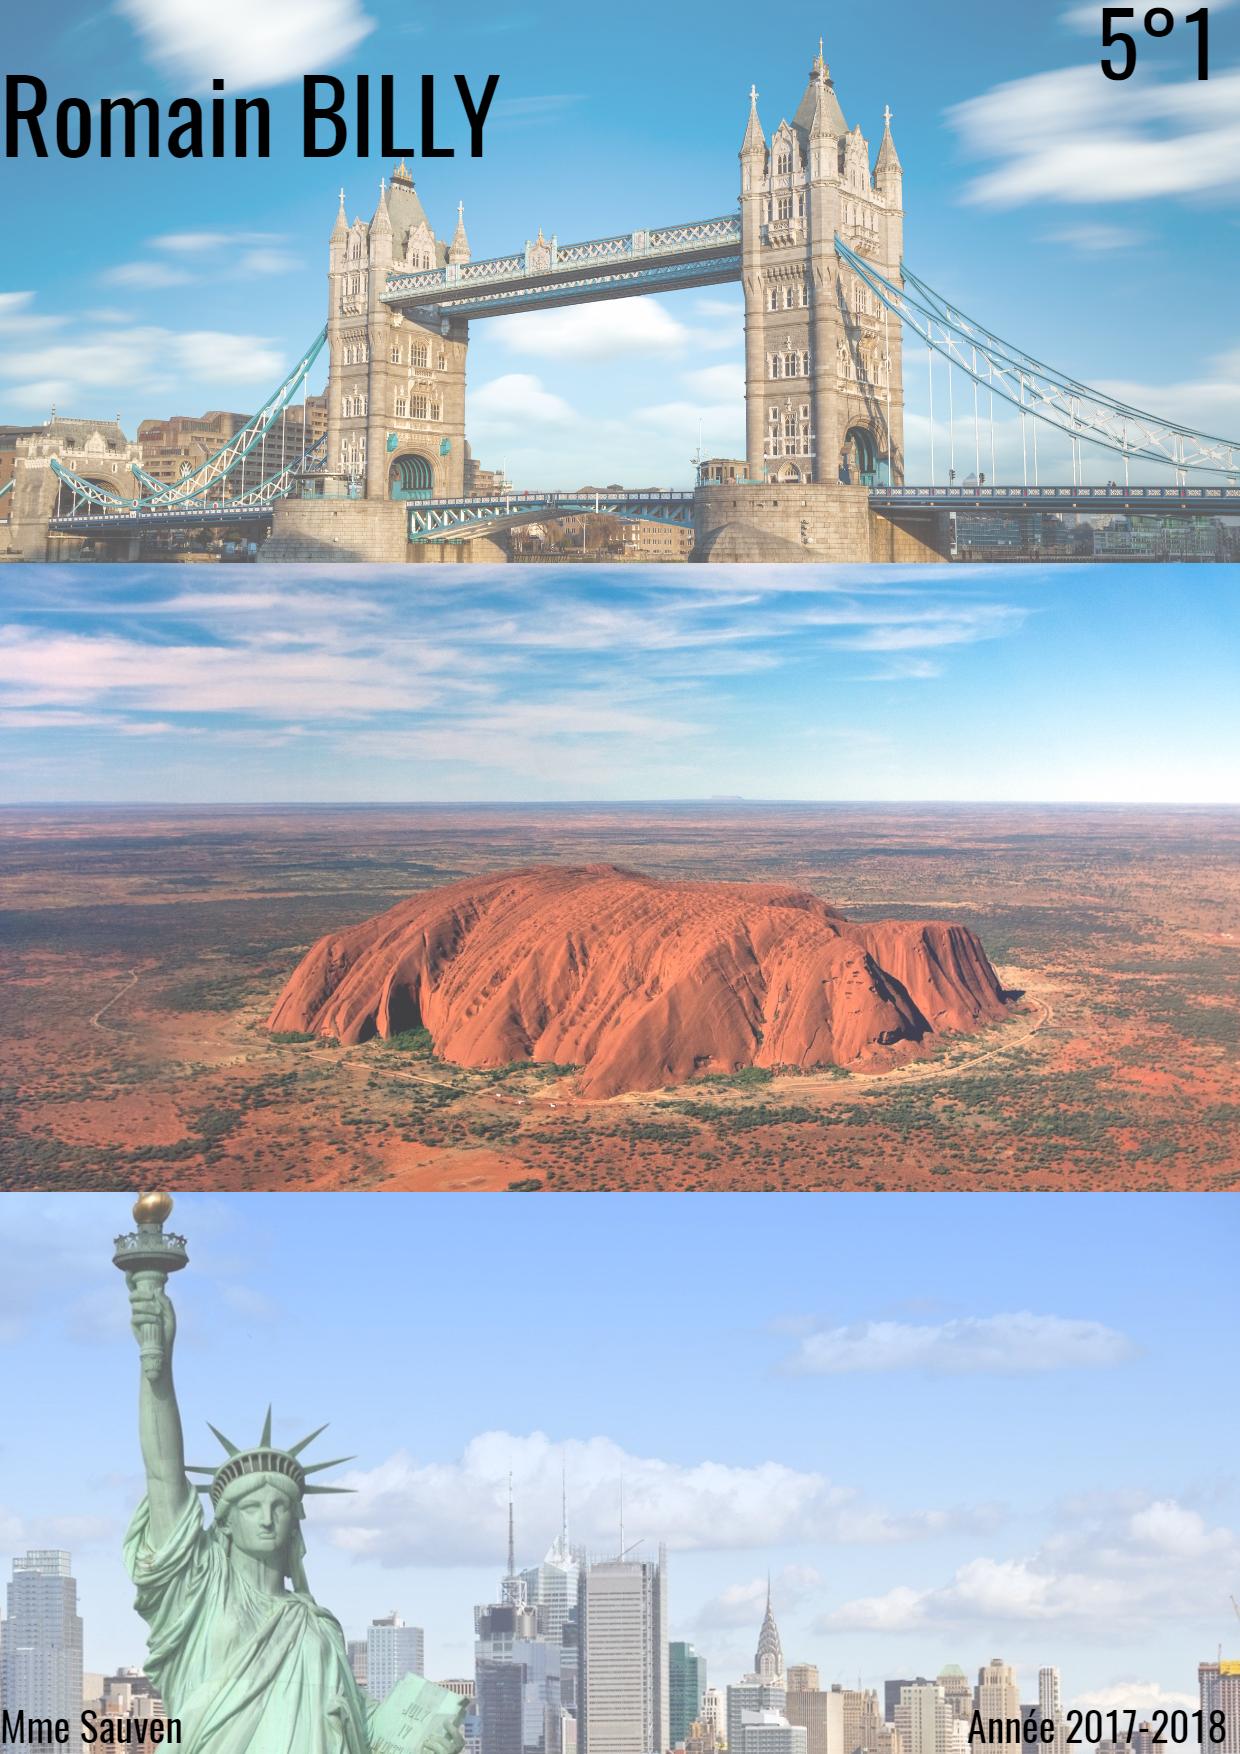 Landmark,                Sky,                Historic,                Site,                Tourist,                Attraction,                Screenshot,                Tourism,                Computer,                Wallpaper,                City,                Metropolis,                Skyscraper,                 Free Image